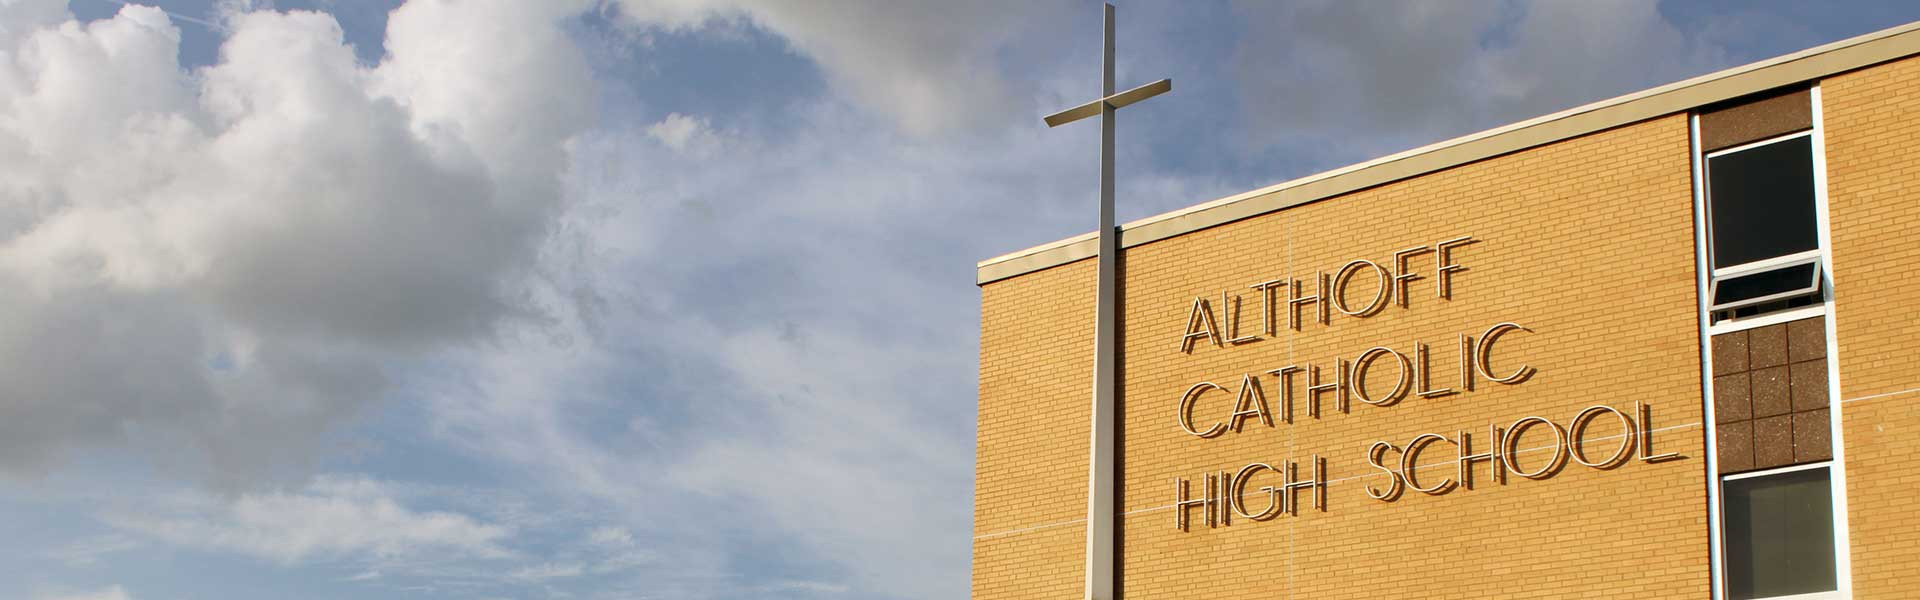 AlthoffCatholicHighSchool-Private-IL-SchoolBuilding-Banner-2020